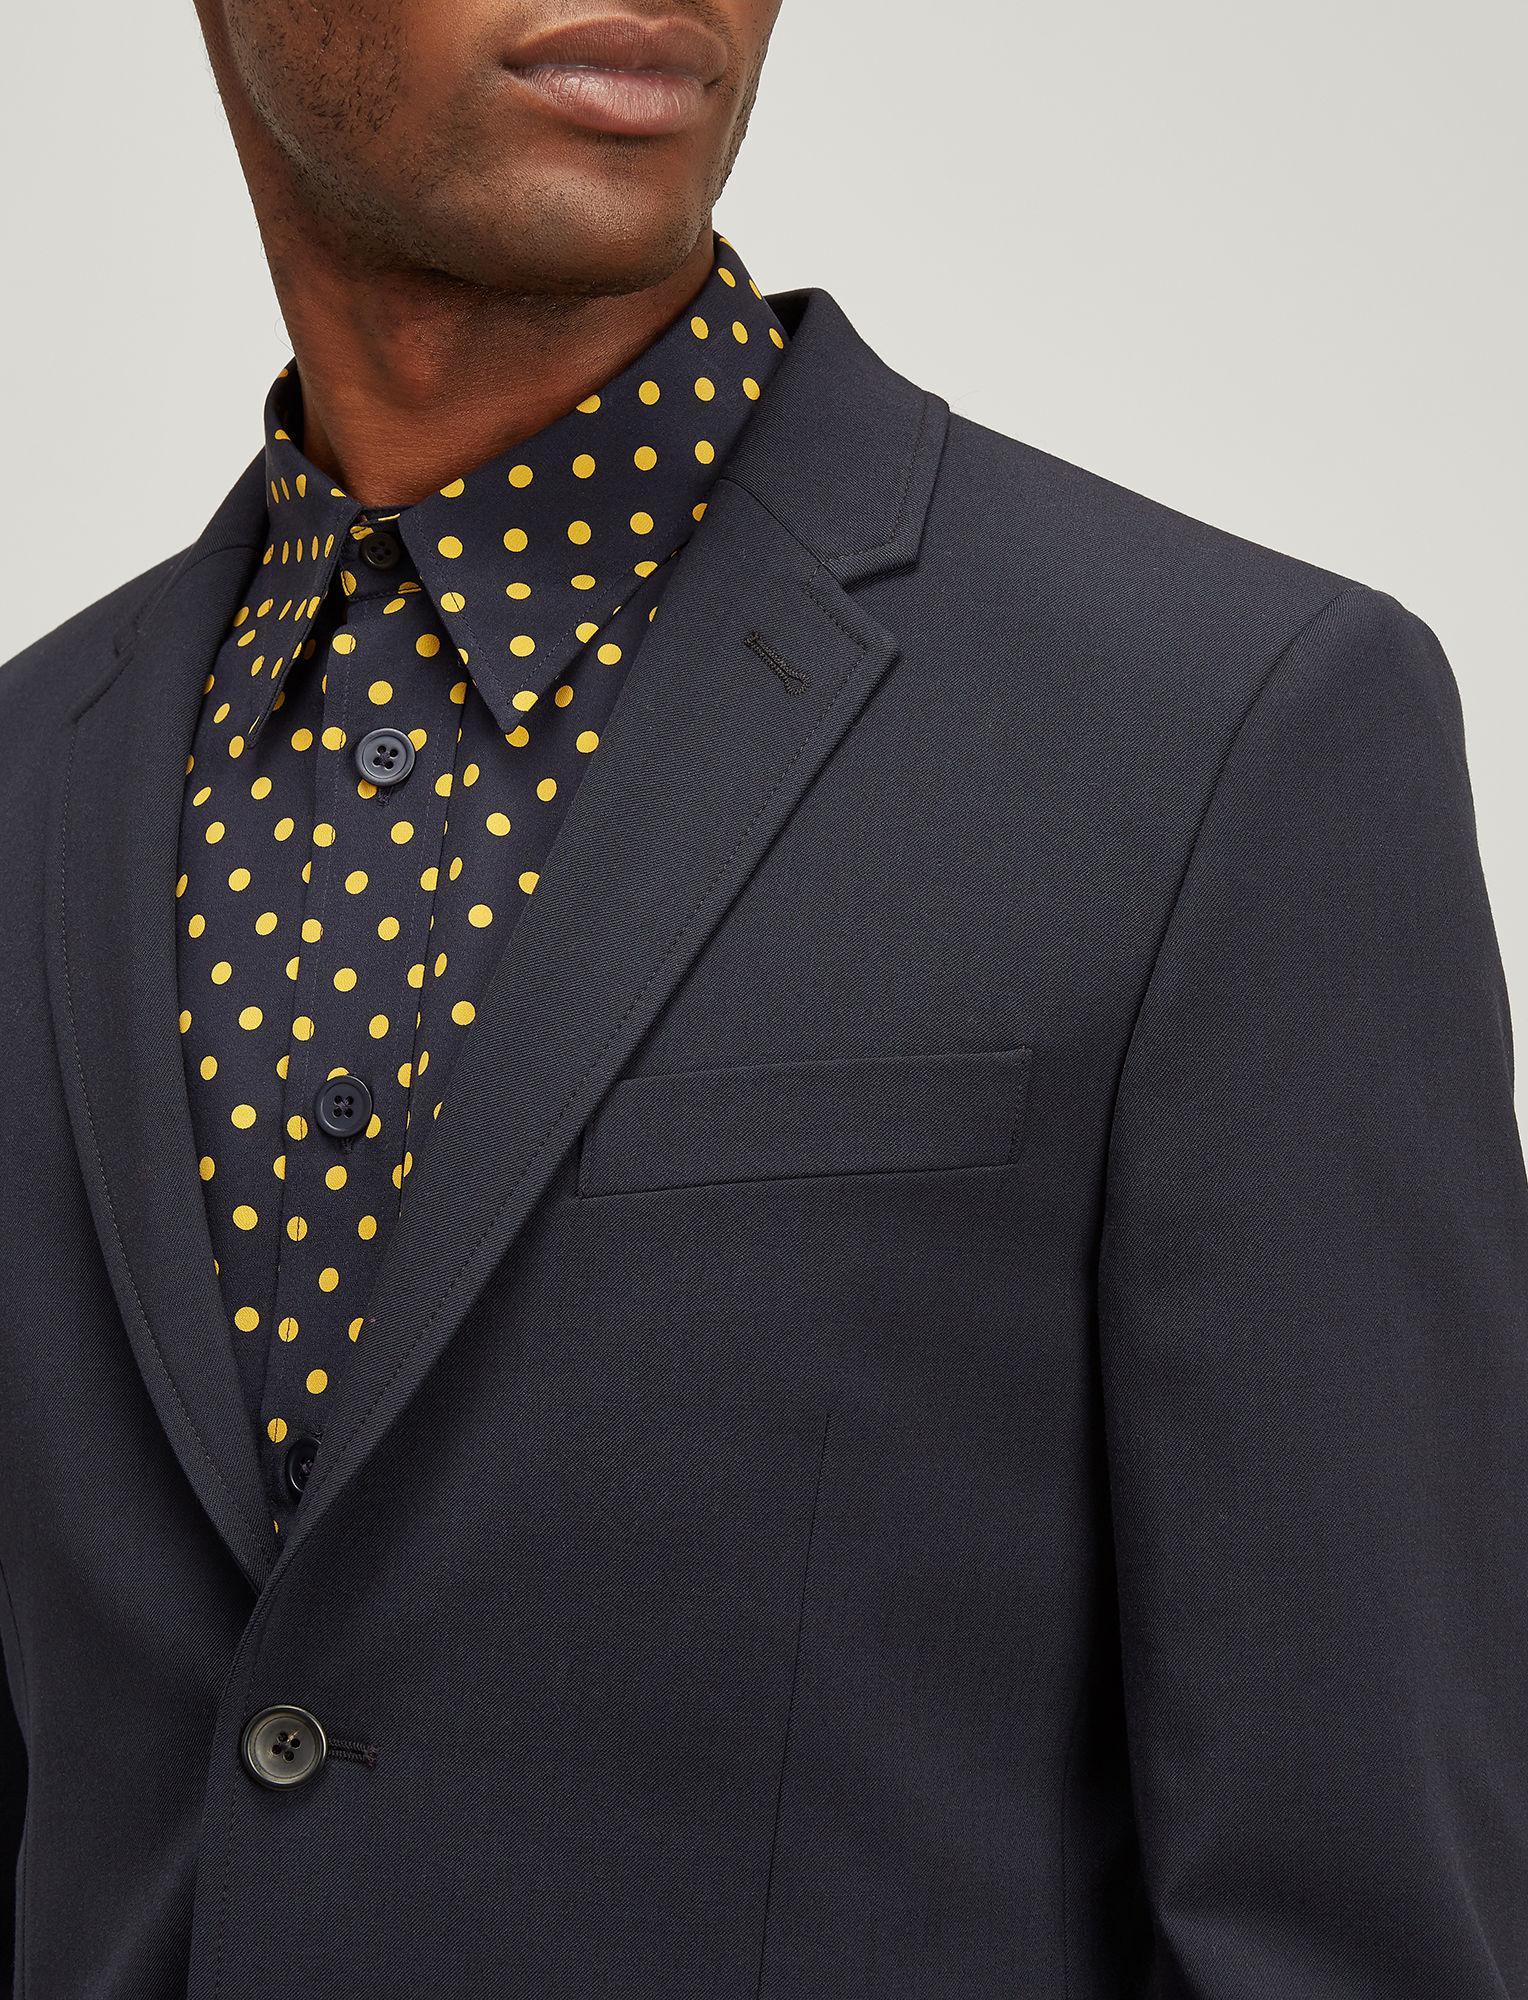 0f34df60f7 JOSEPH Techno Wool Stretch Reading Jacket in Blue for Men - Lyst